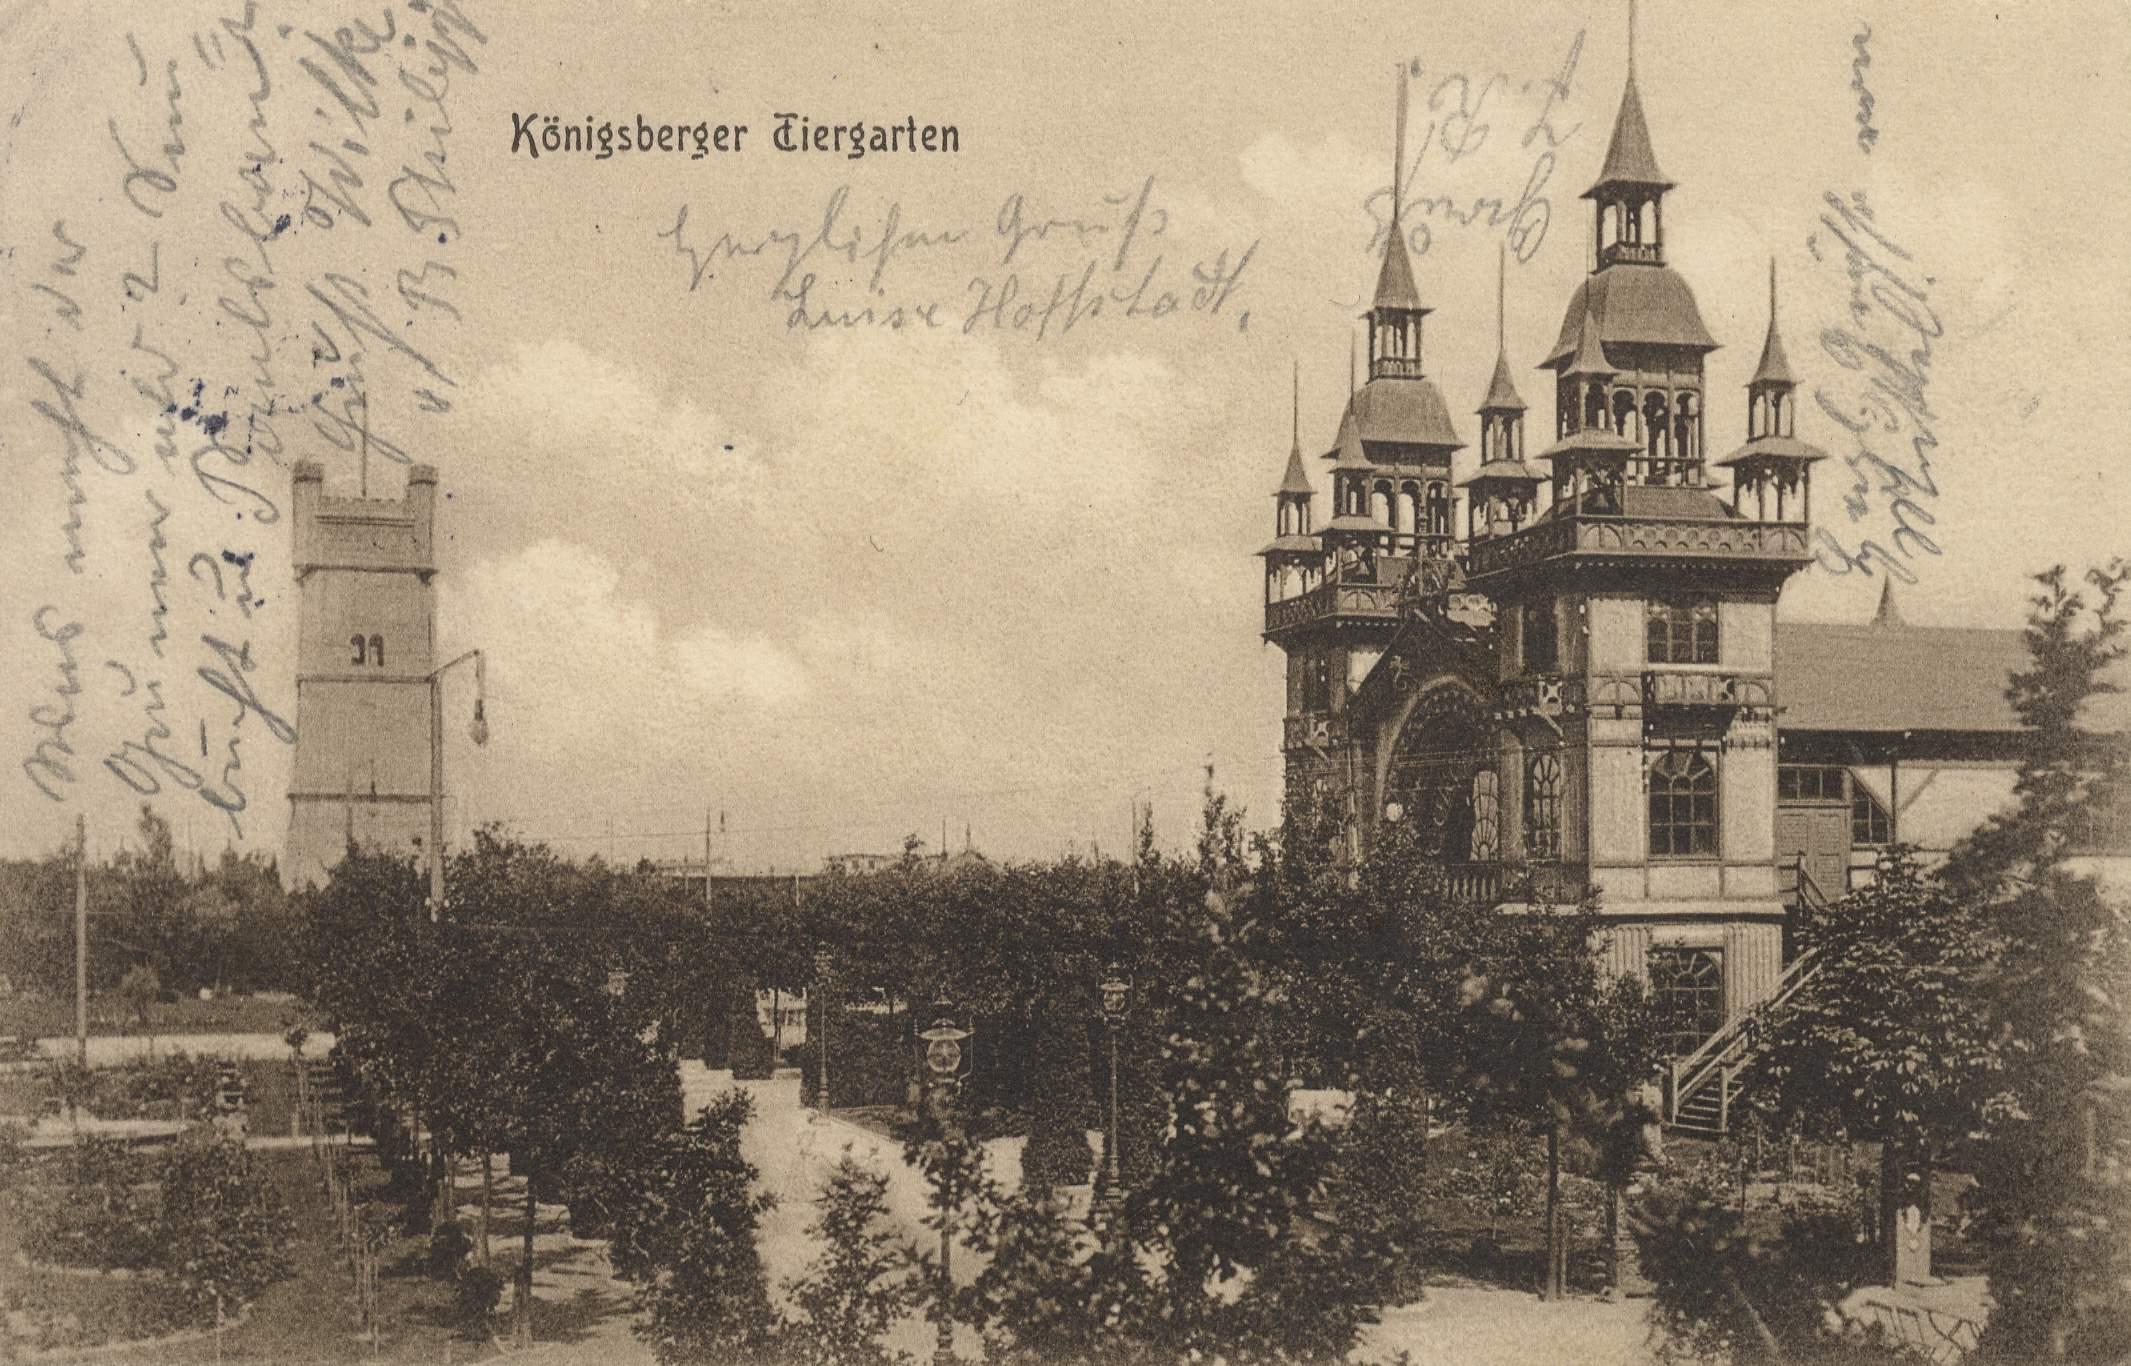 Königsberg O Pr Ostpreußen Schloss Pictures to pin on Pinterest